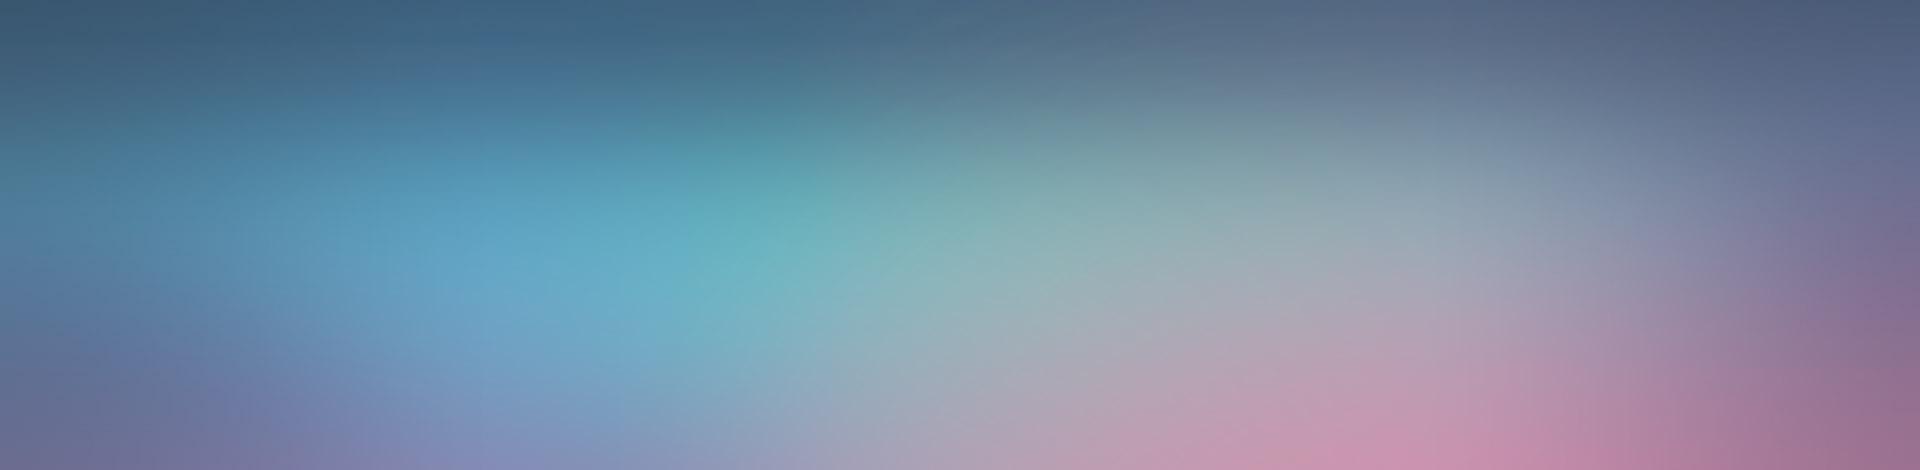 slider_background_5